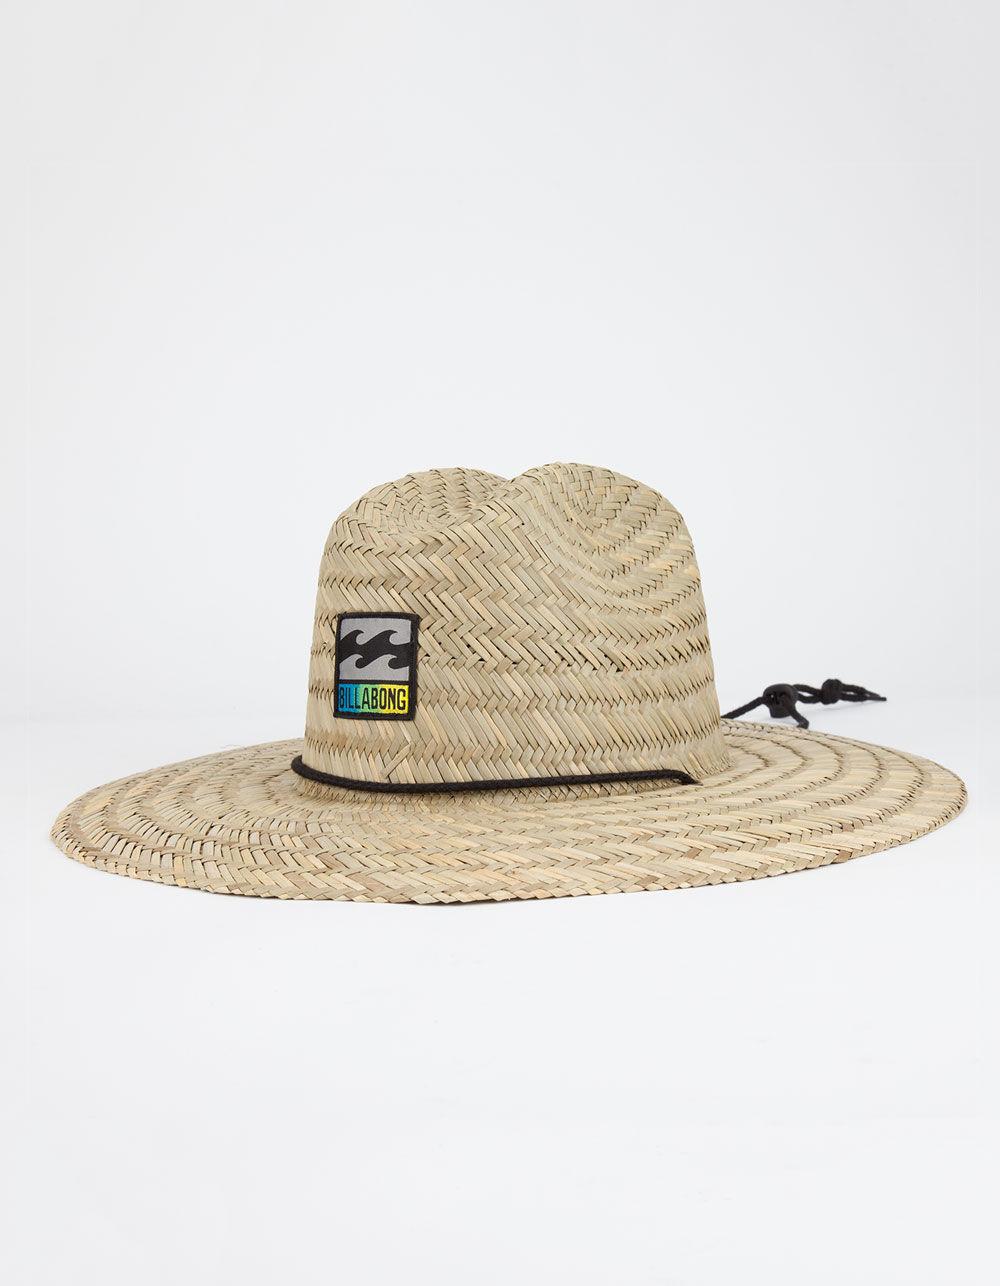 BILLABONG Patches Lifeguard Straw Hat